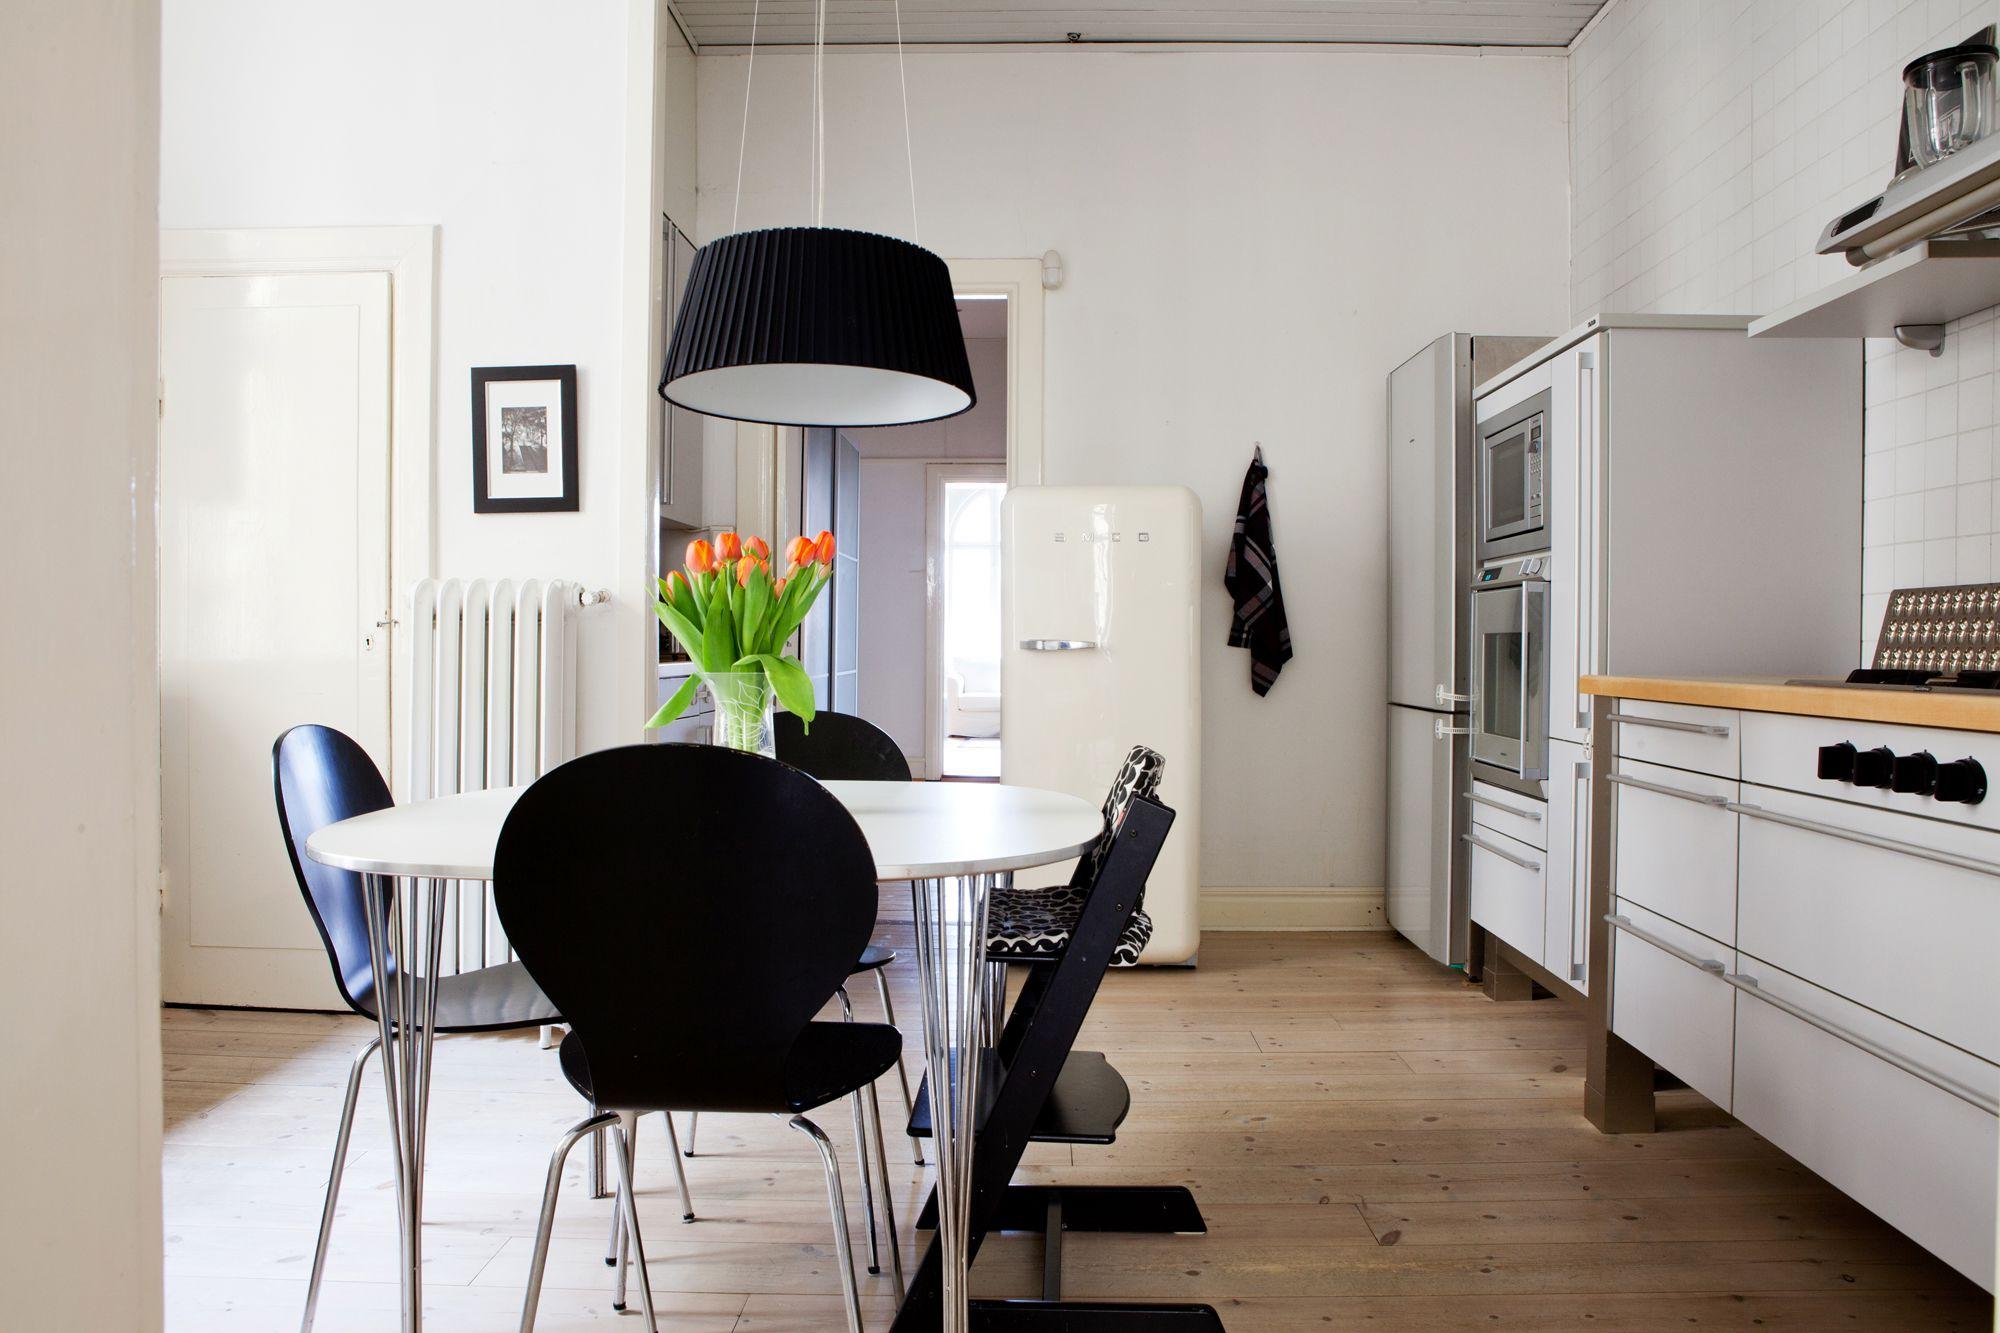 Decoraci n paredes blancas empapeladas con motivos for Cocinas empapeladas